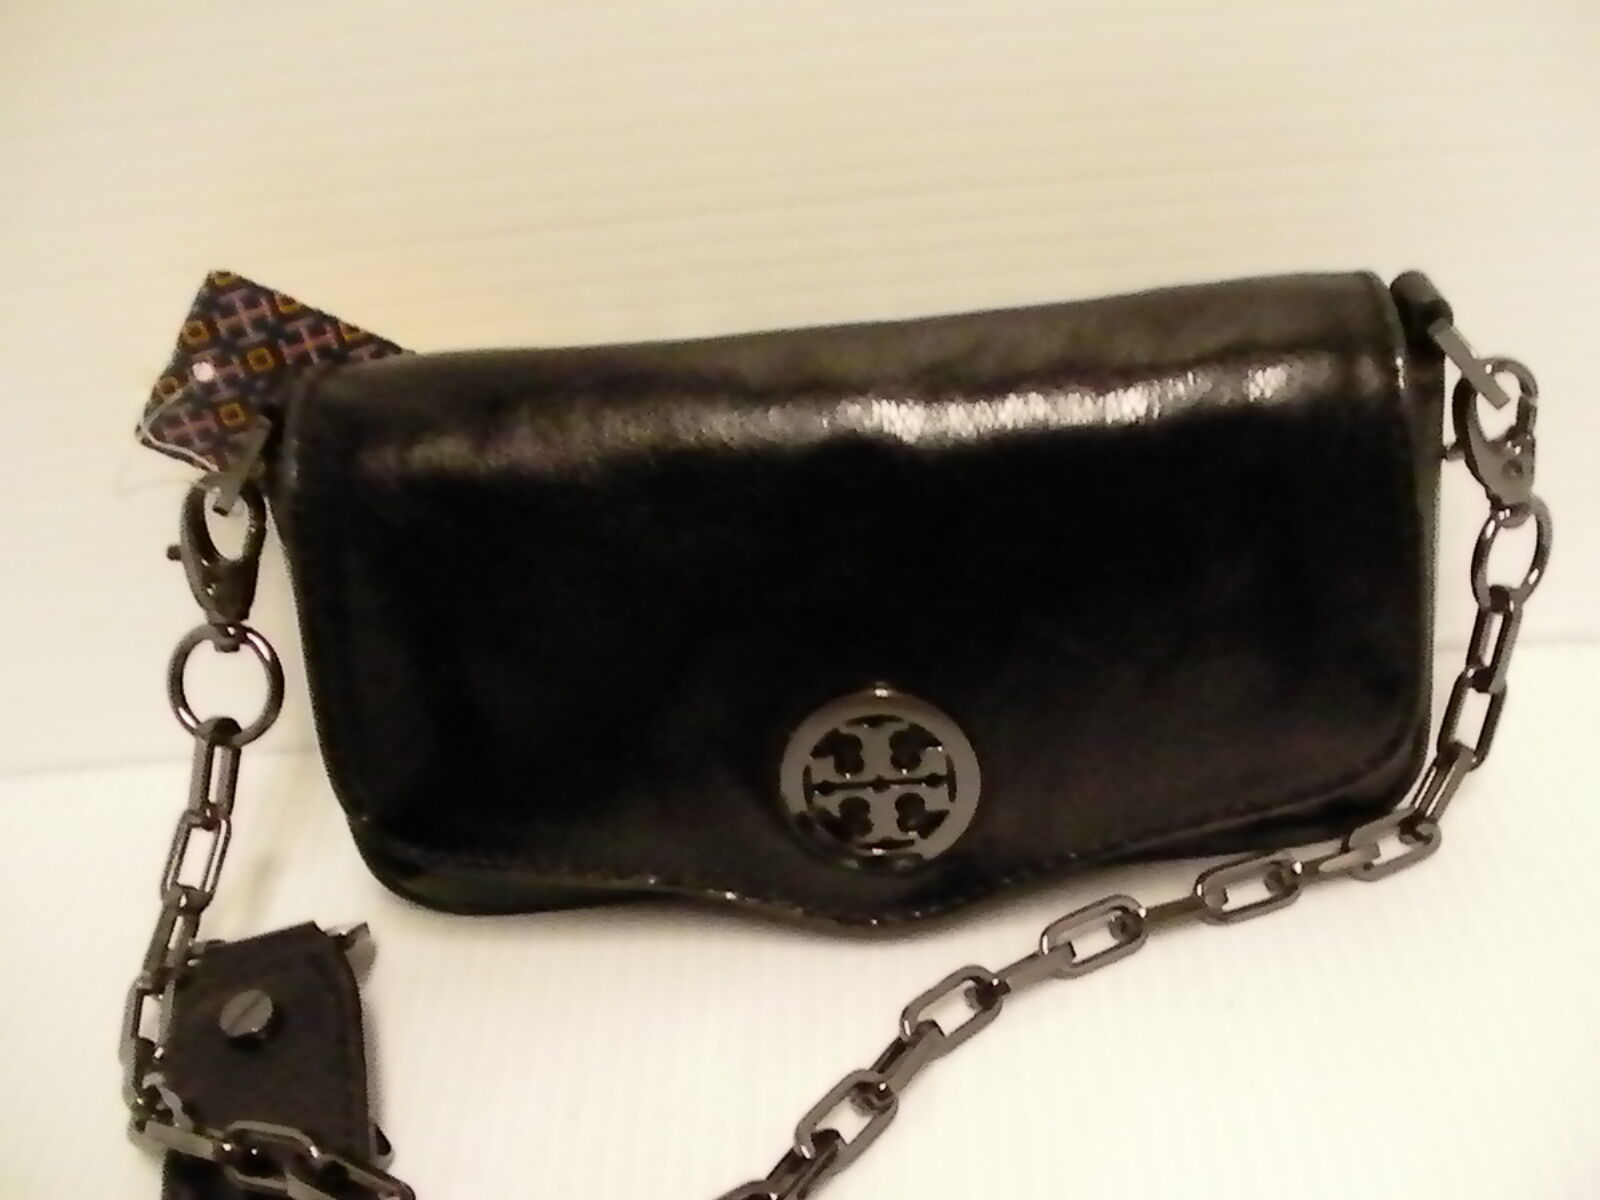 Tory burch crossbody black classic mini bag retail new